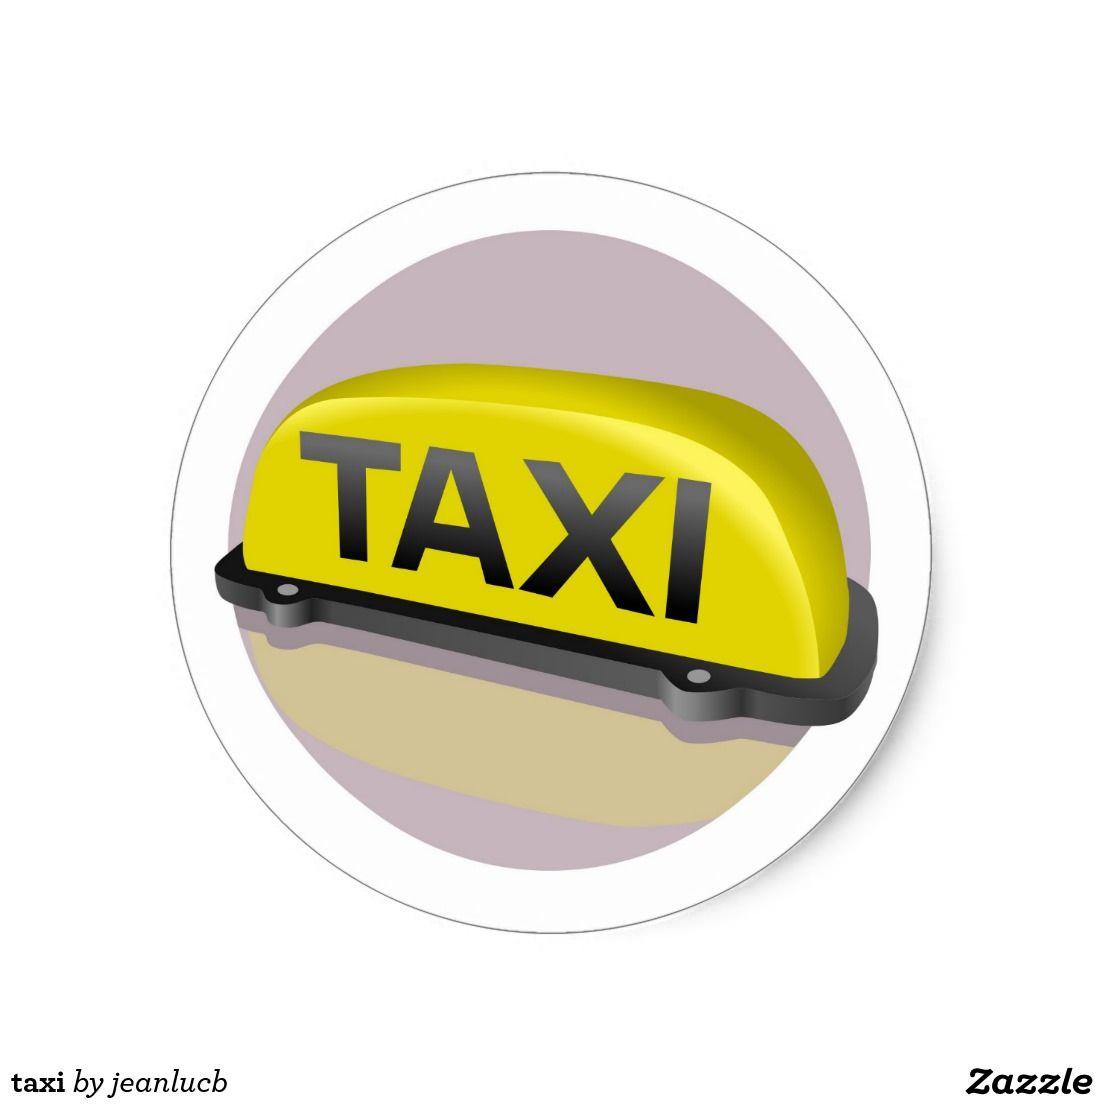 Taxi Classic Round Sticker Zazzle Com Round Stickers Classic Custom Stickers [ 1104 x 1104 Pixel ]